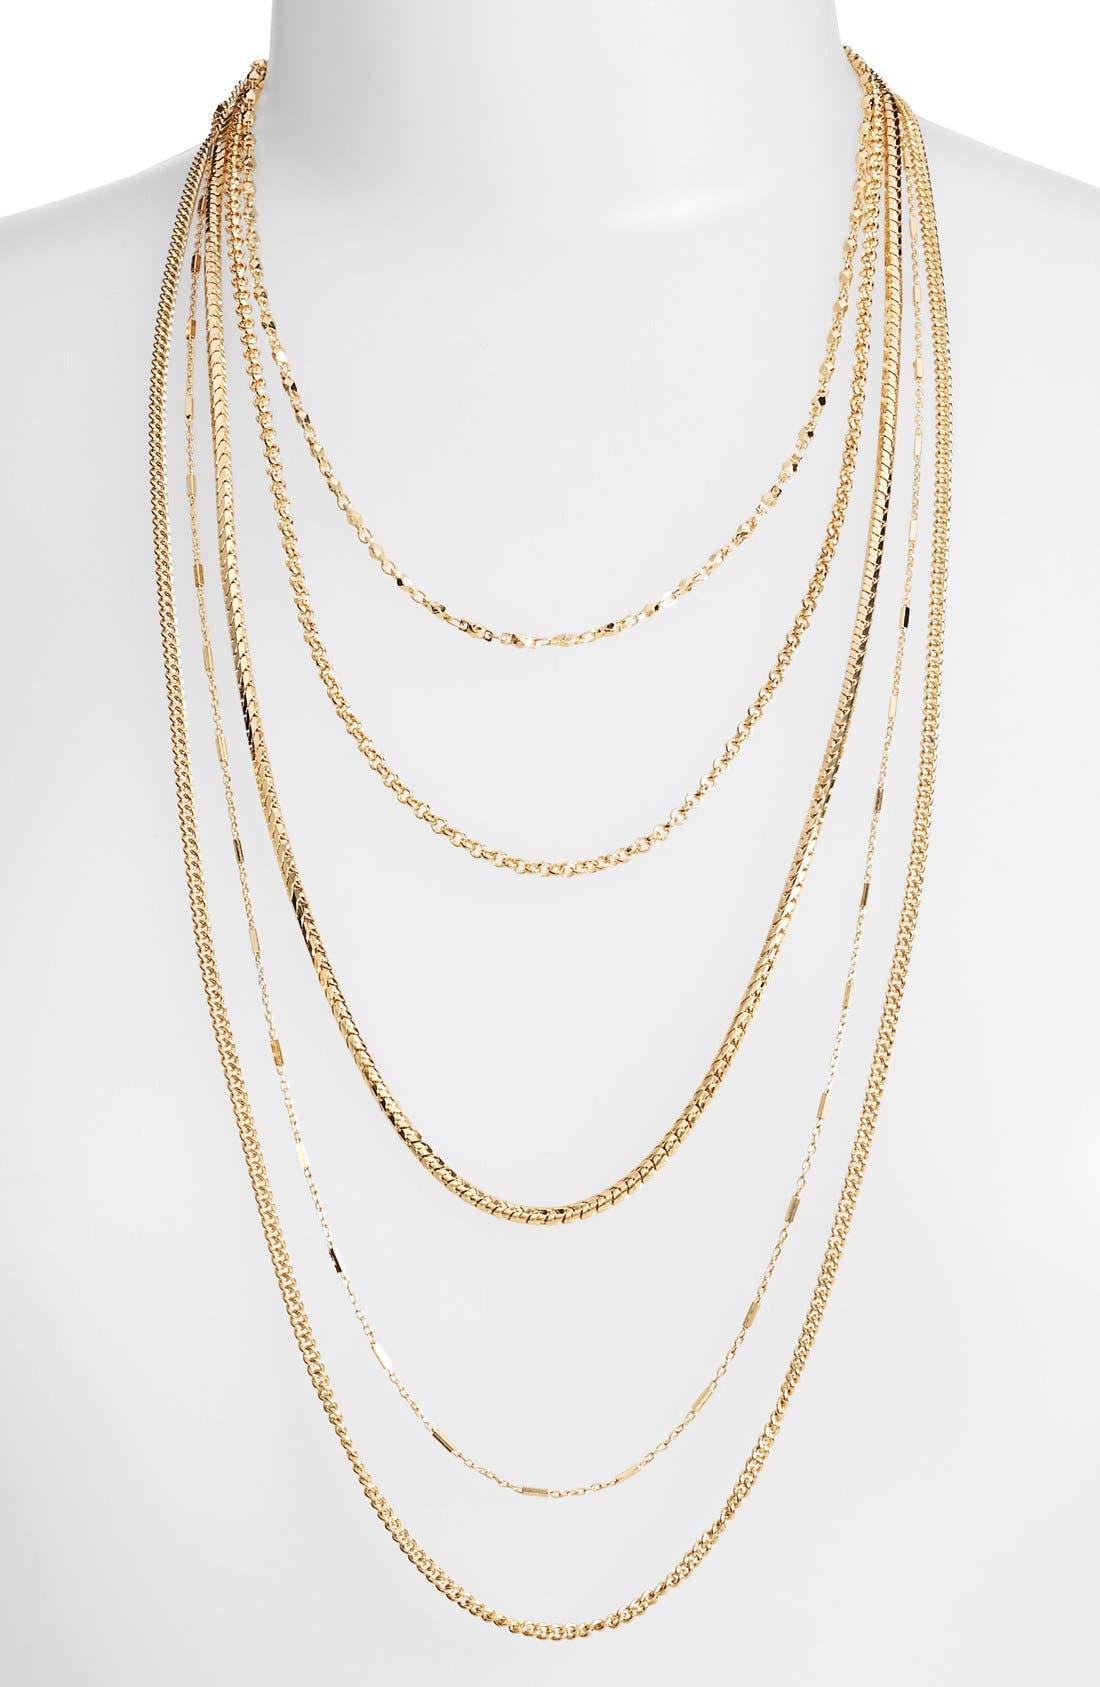 Main Image - Nordstrom Long Multistrand Necklace